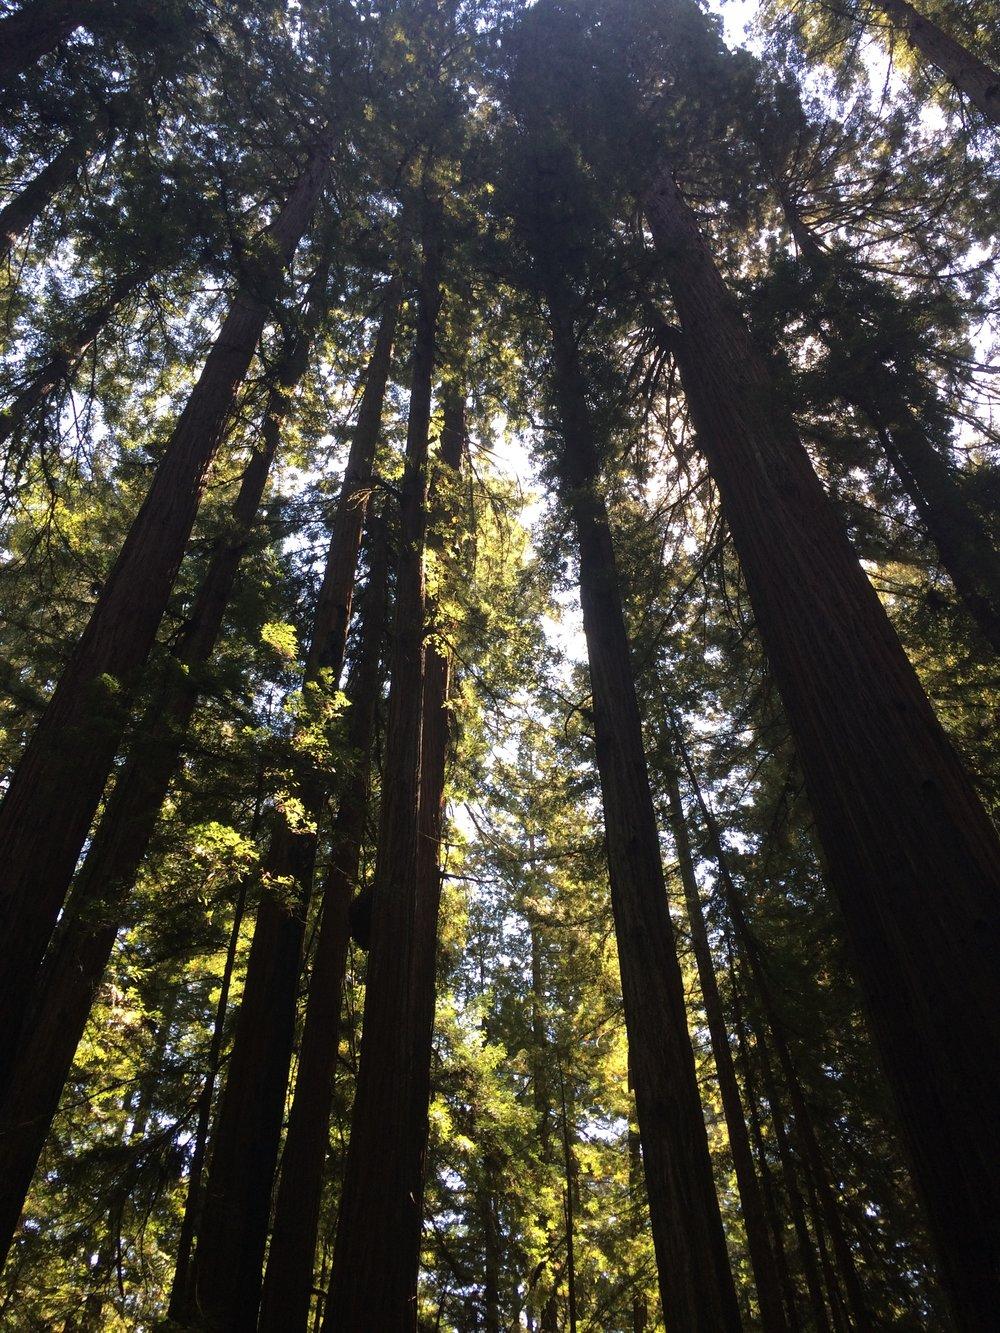 60adb-redwoodsredwoods.jpg